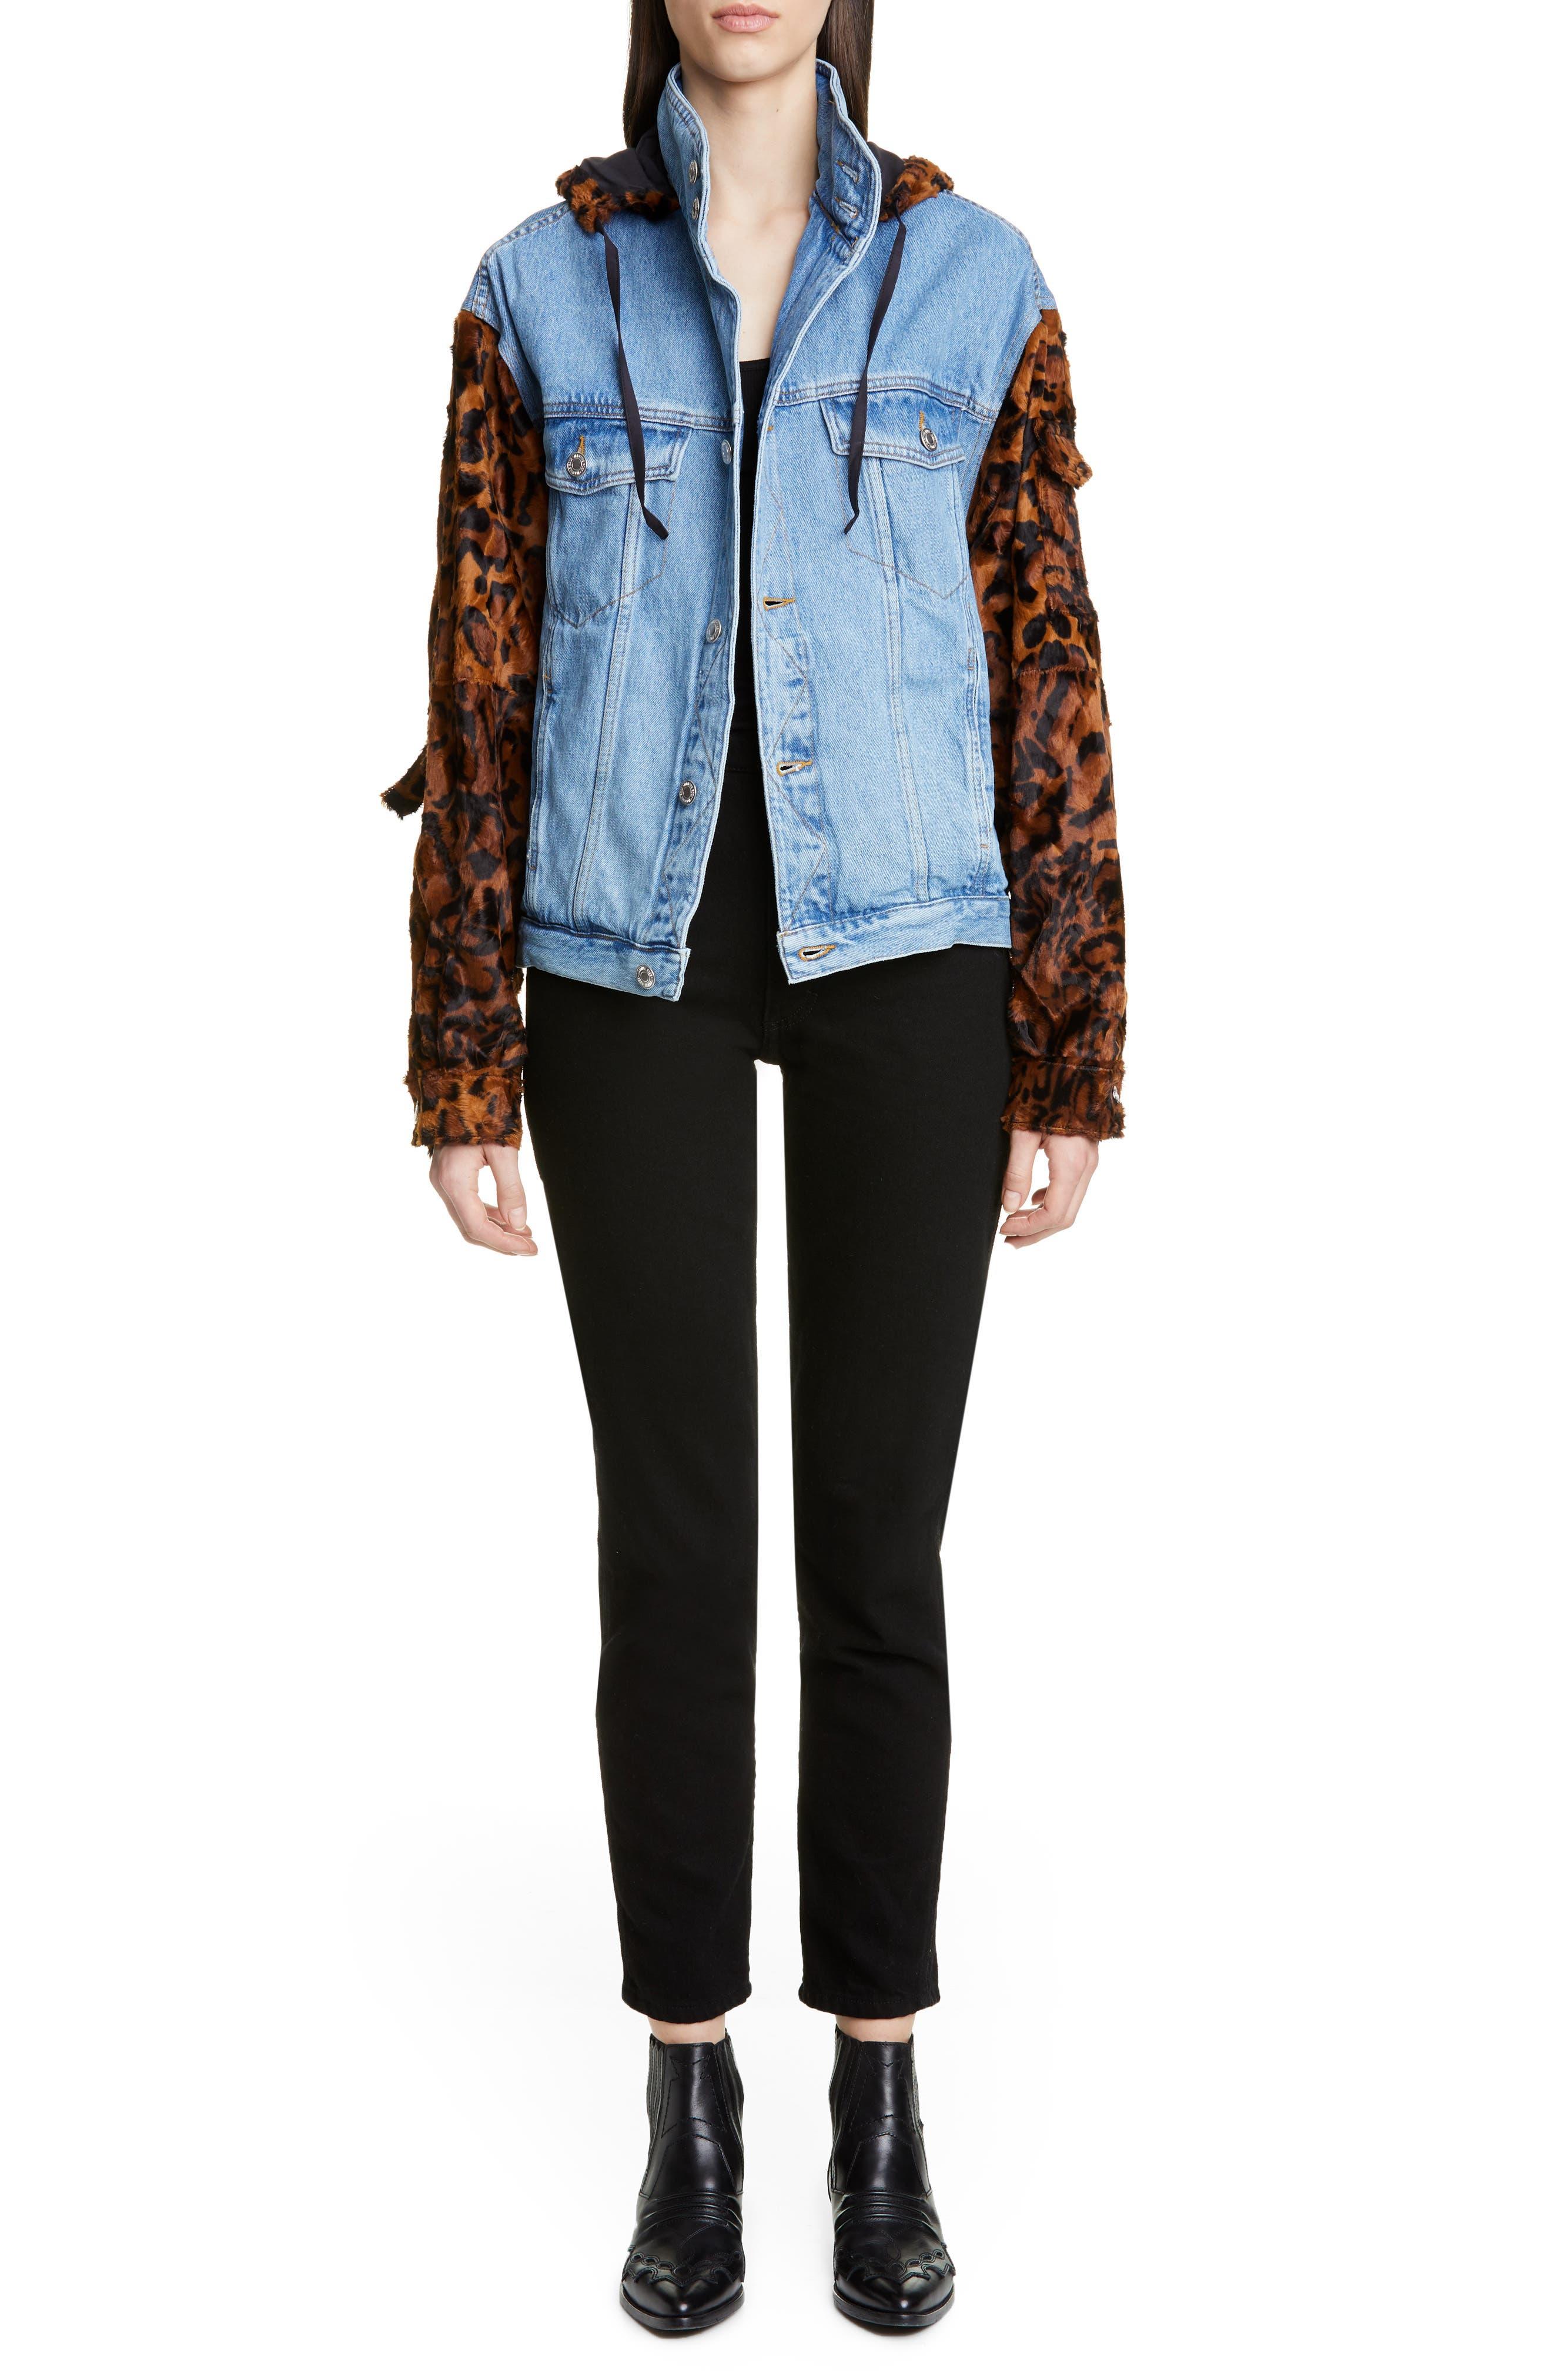 MARTINE ROSE, Leopard Hooded Denim Jacket, Alternate thumbnail 8, color, LIGHT DENIM DARK